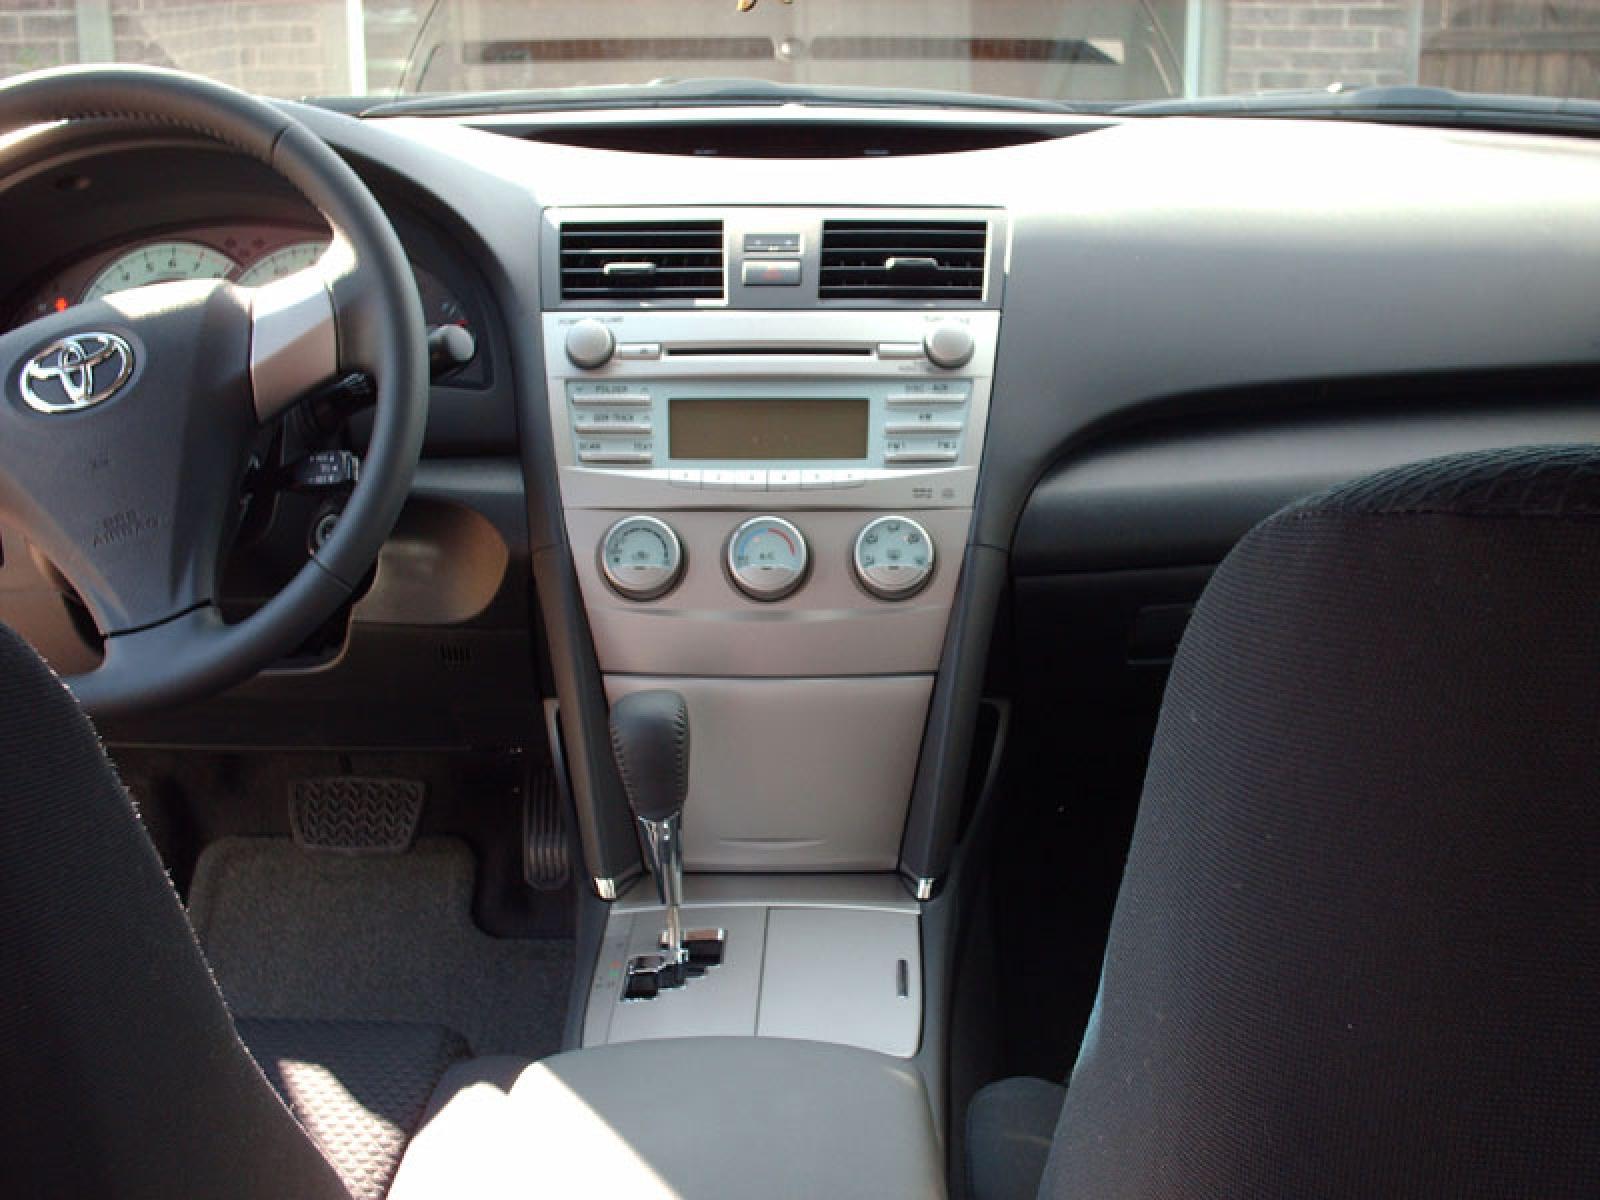 Captivating 800 1024 1280 1600 Origin 2008 Toyota Camry ...